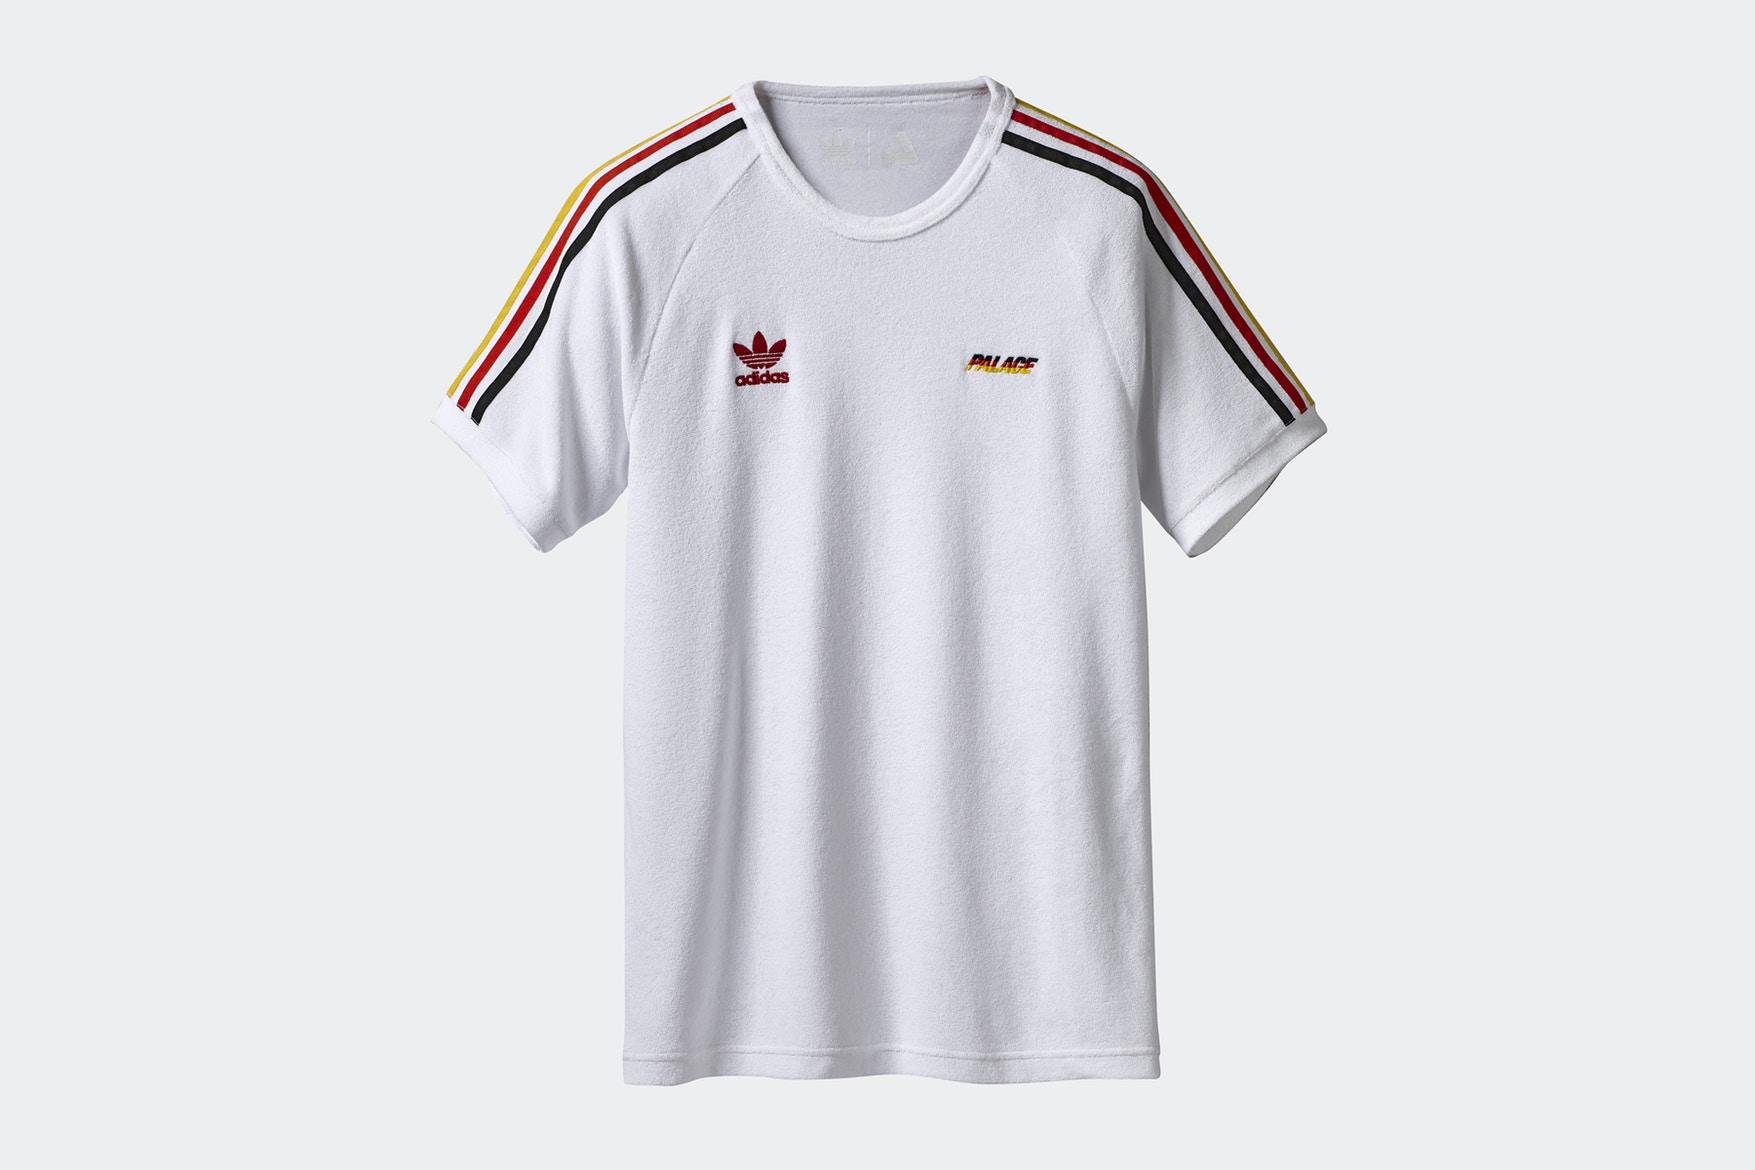 palace-adidas-originals-summer-2018-collection-0003.jpg